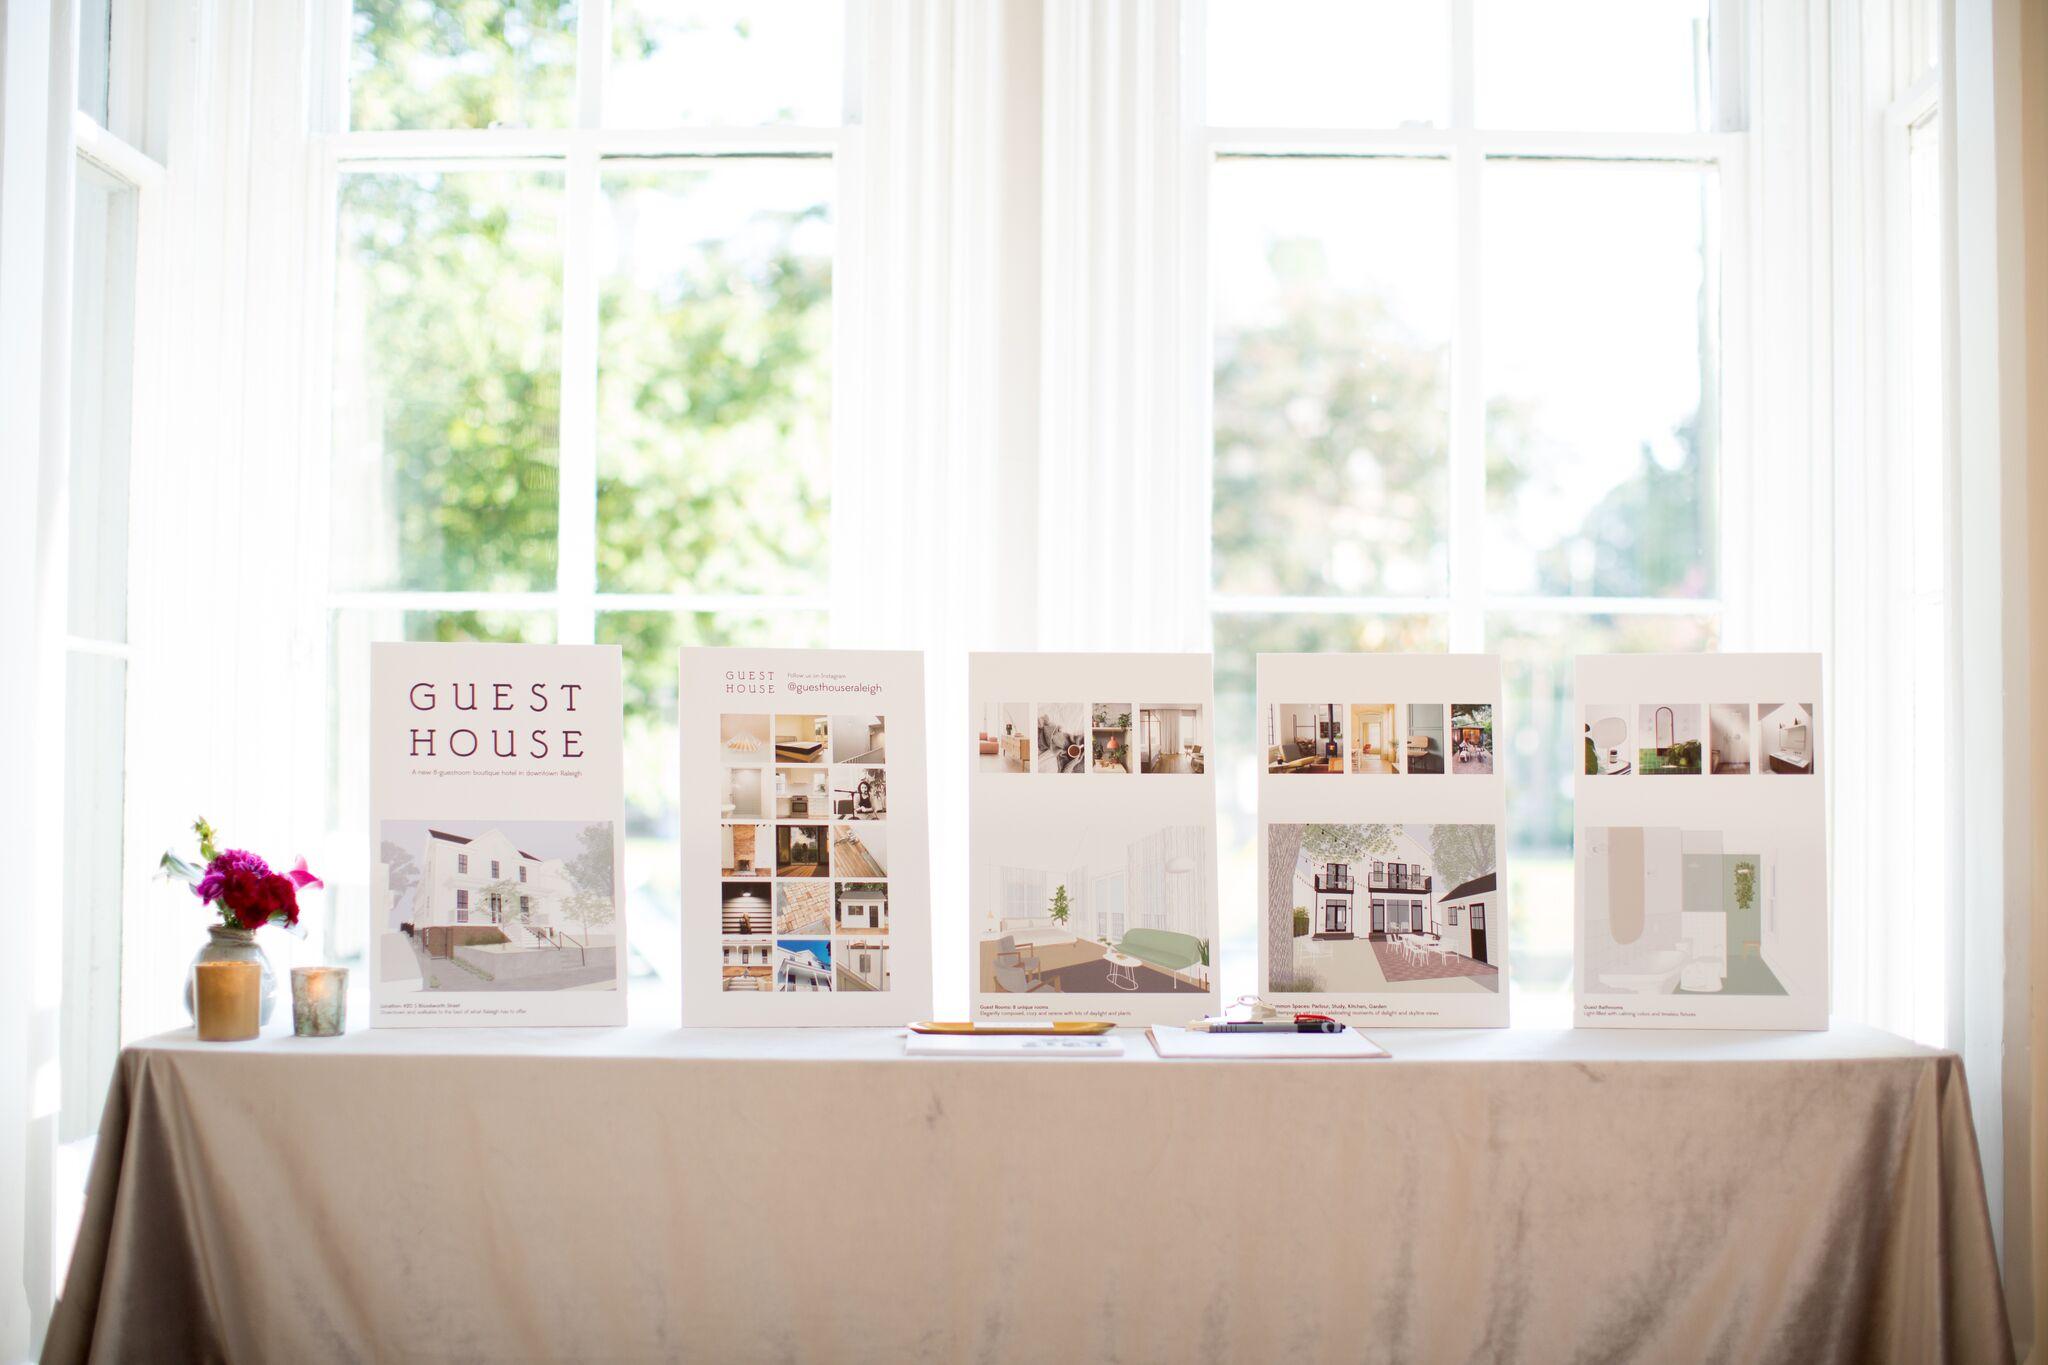 C & D EVENTS    GUEST HOUSE    PARTY REFLECTIONS    KATHERINE MILES JONES PHOTOGRAPHY